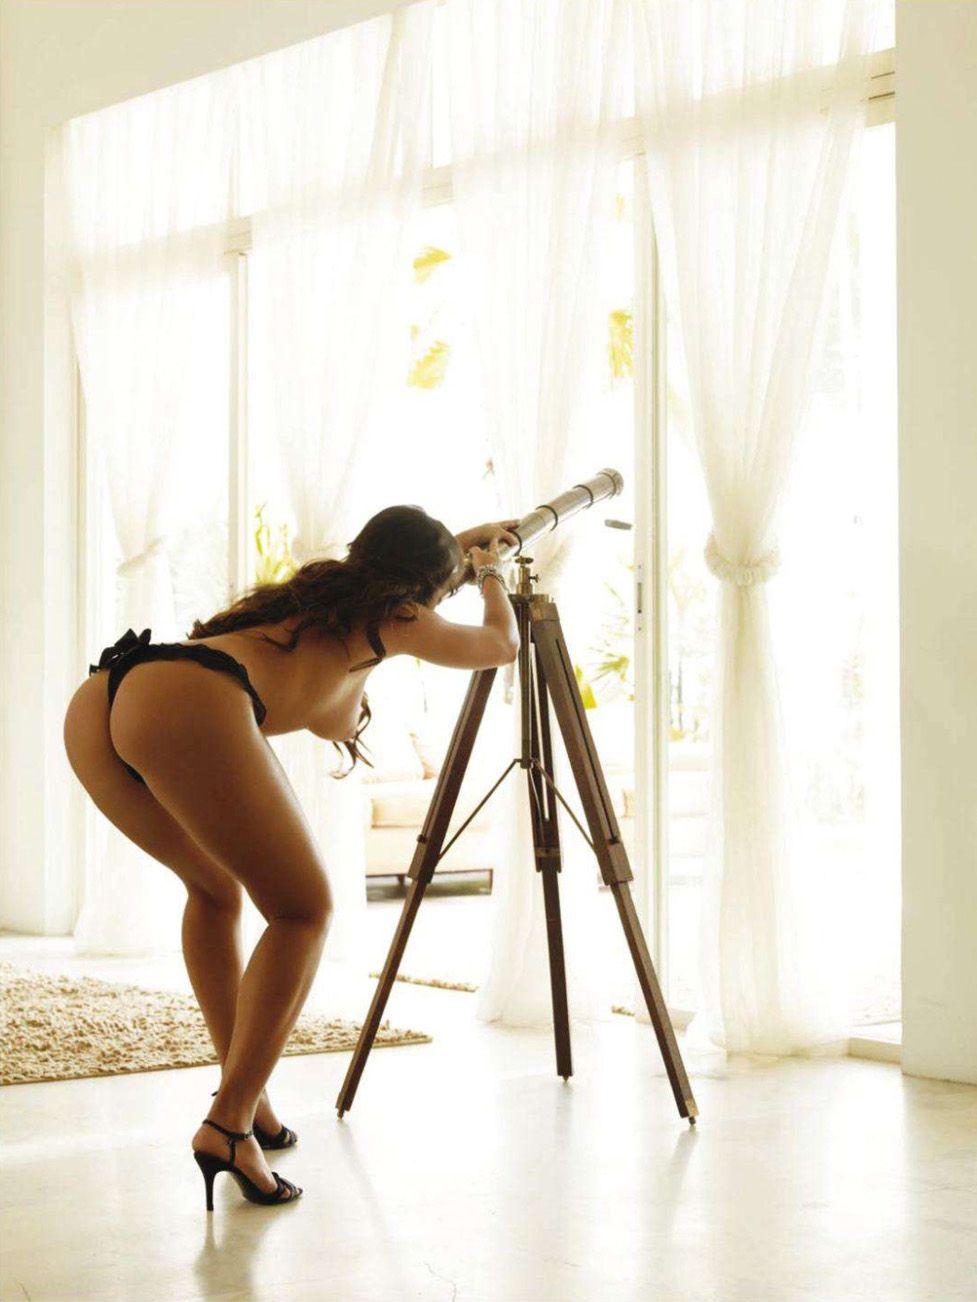 бразильские девушки / Especial Brasilenas in Playboy Spain january 2011 - Juliana Goes